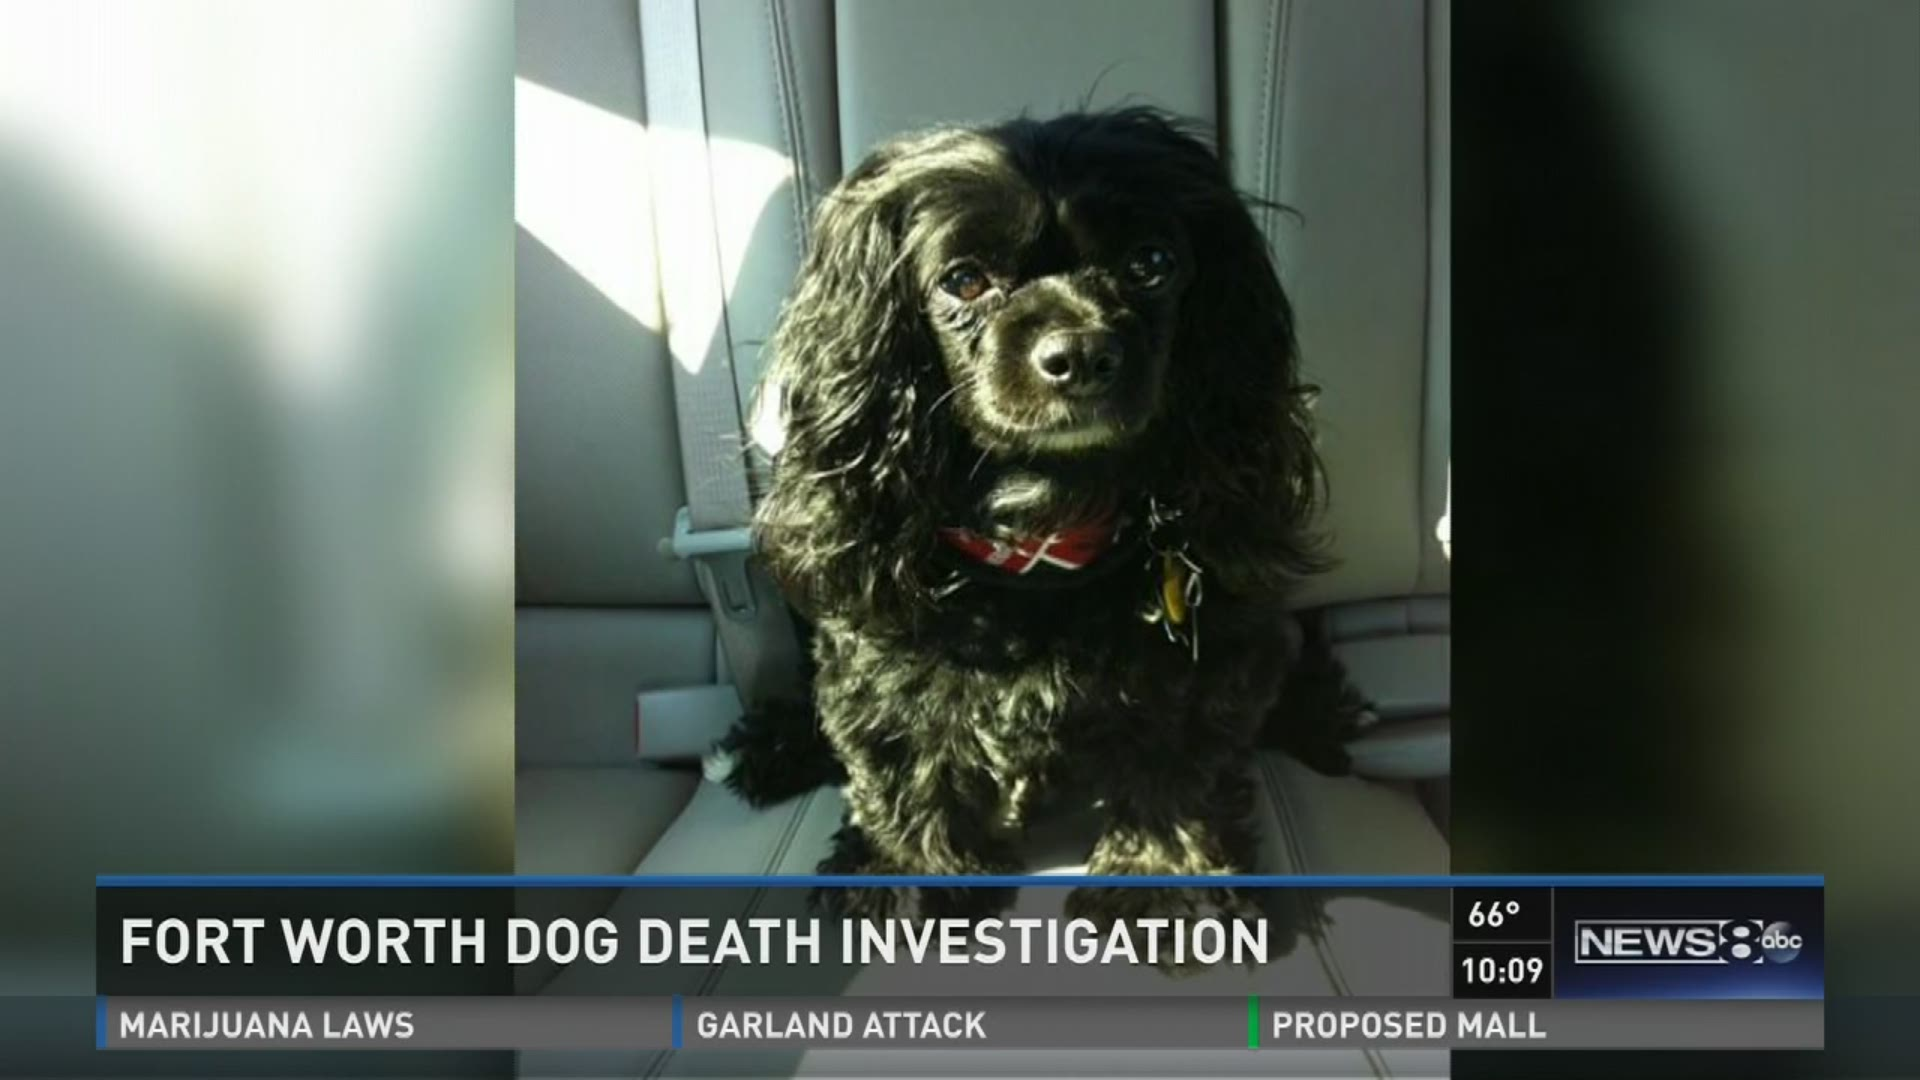 Fort Worth dog death investigation